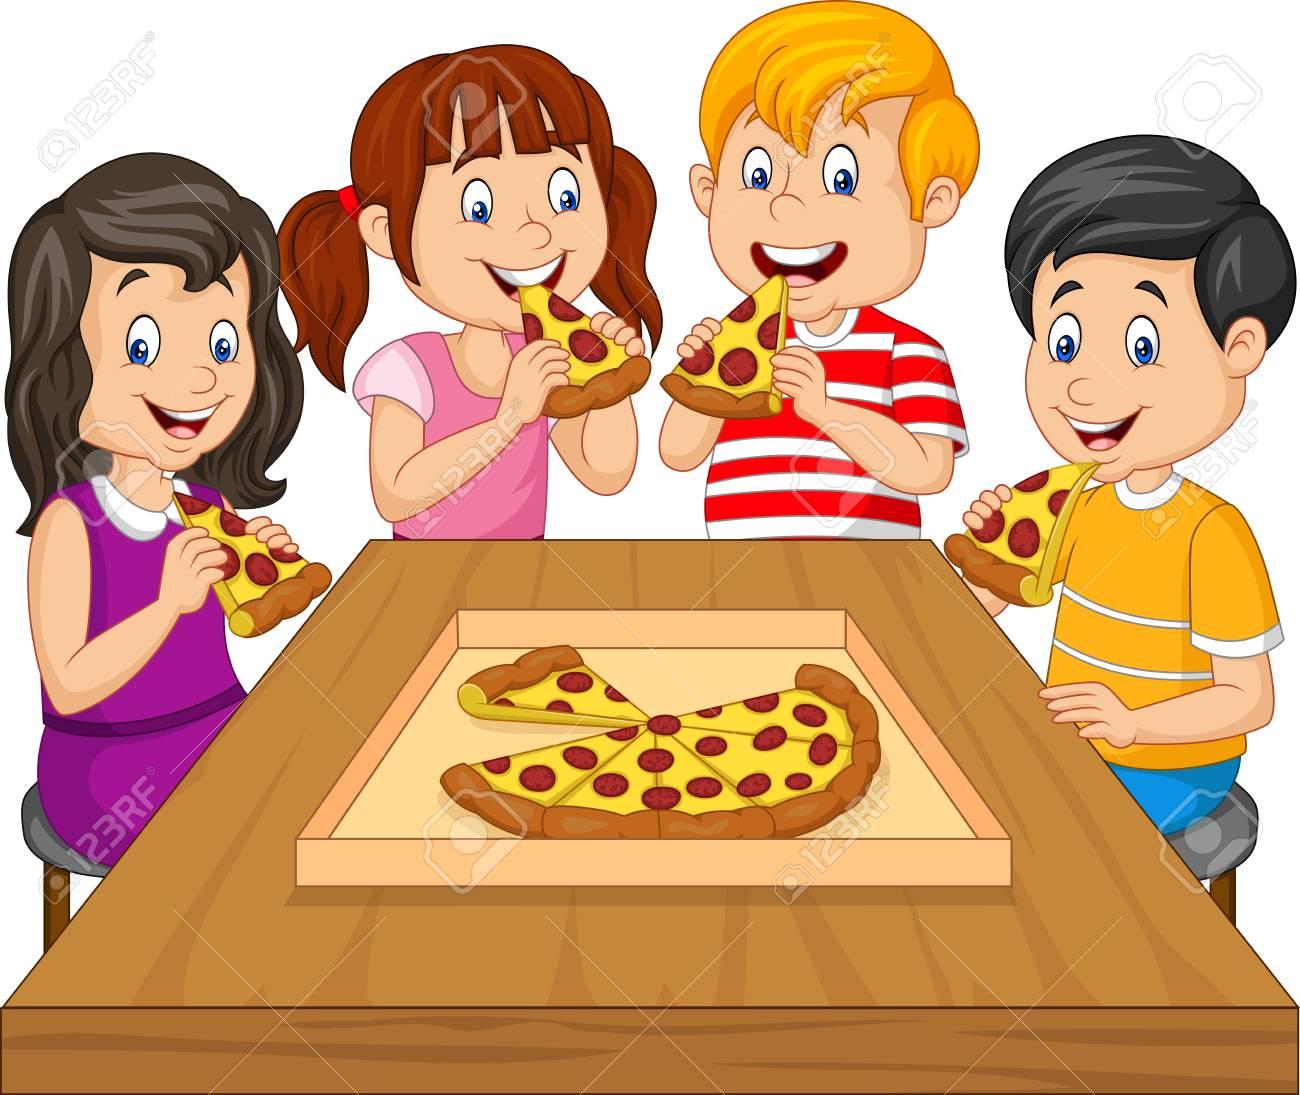 Cartoon kids eating pizza together.